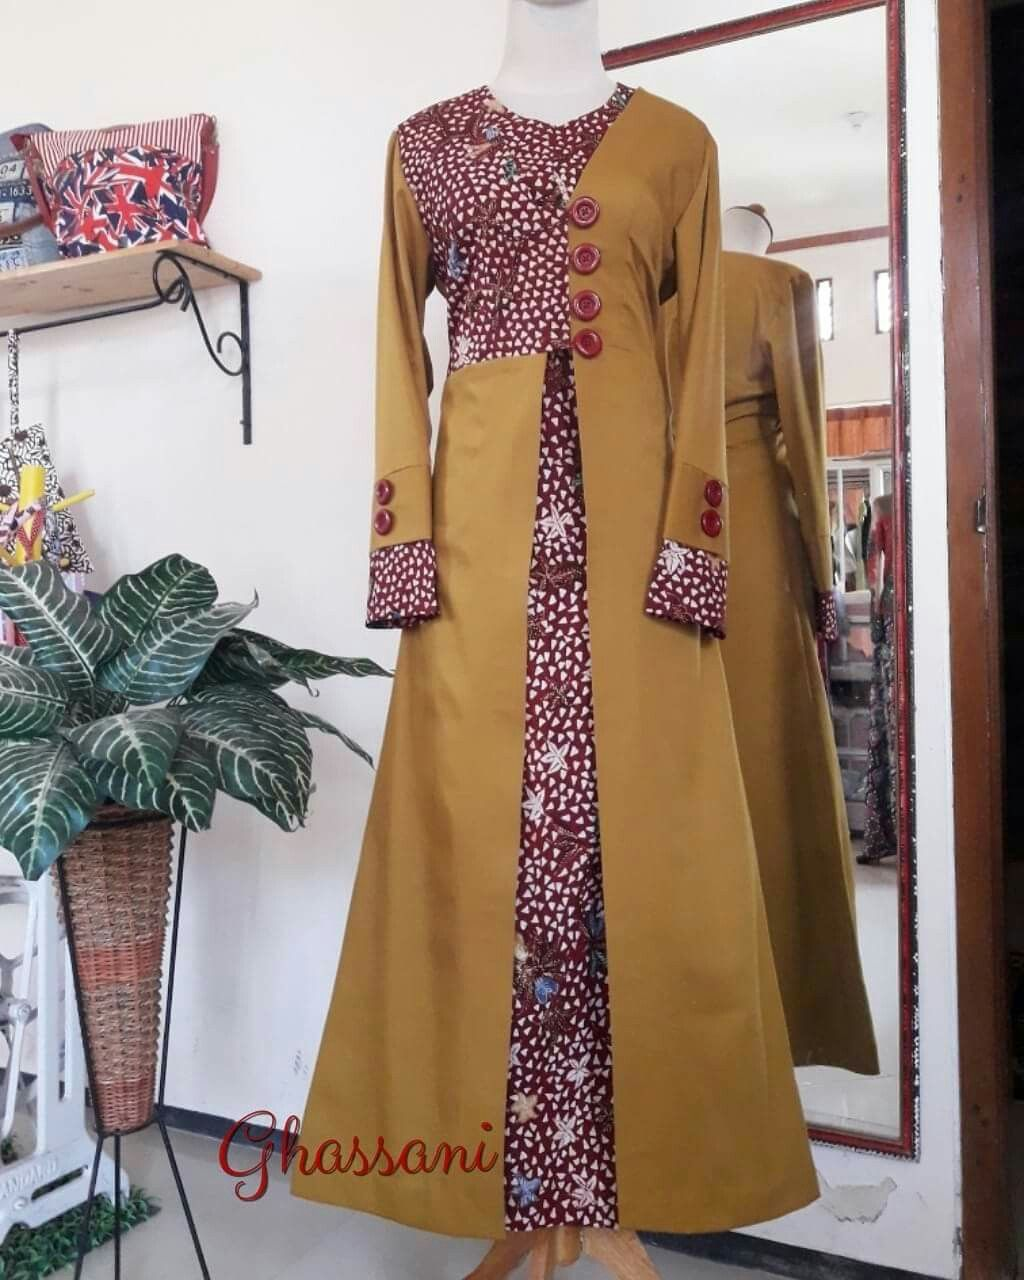 Ghasani collection  Pakaian wanita, Model pakaian wanita, Model